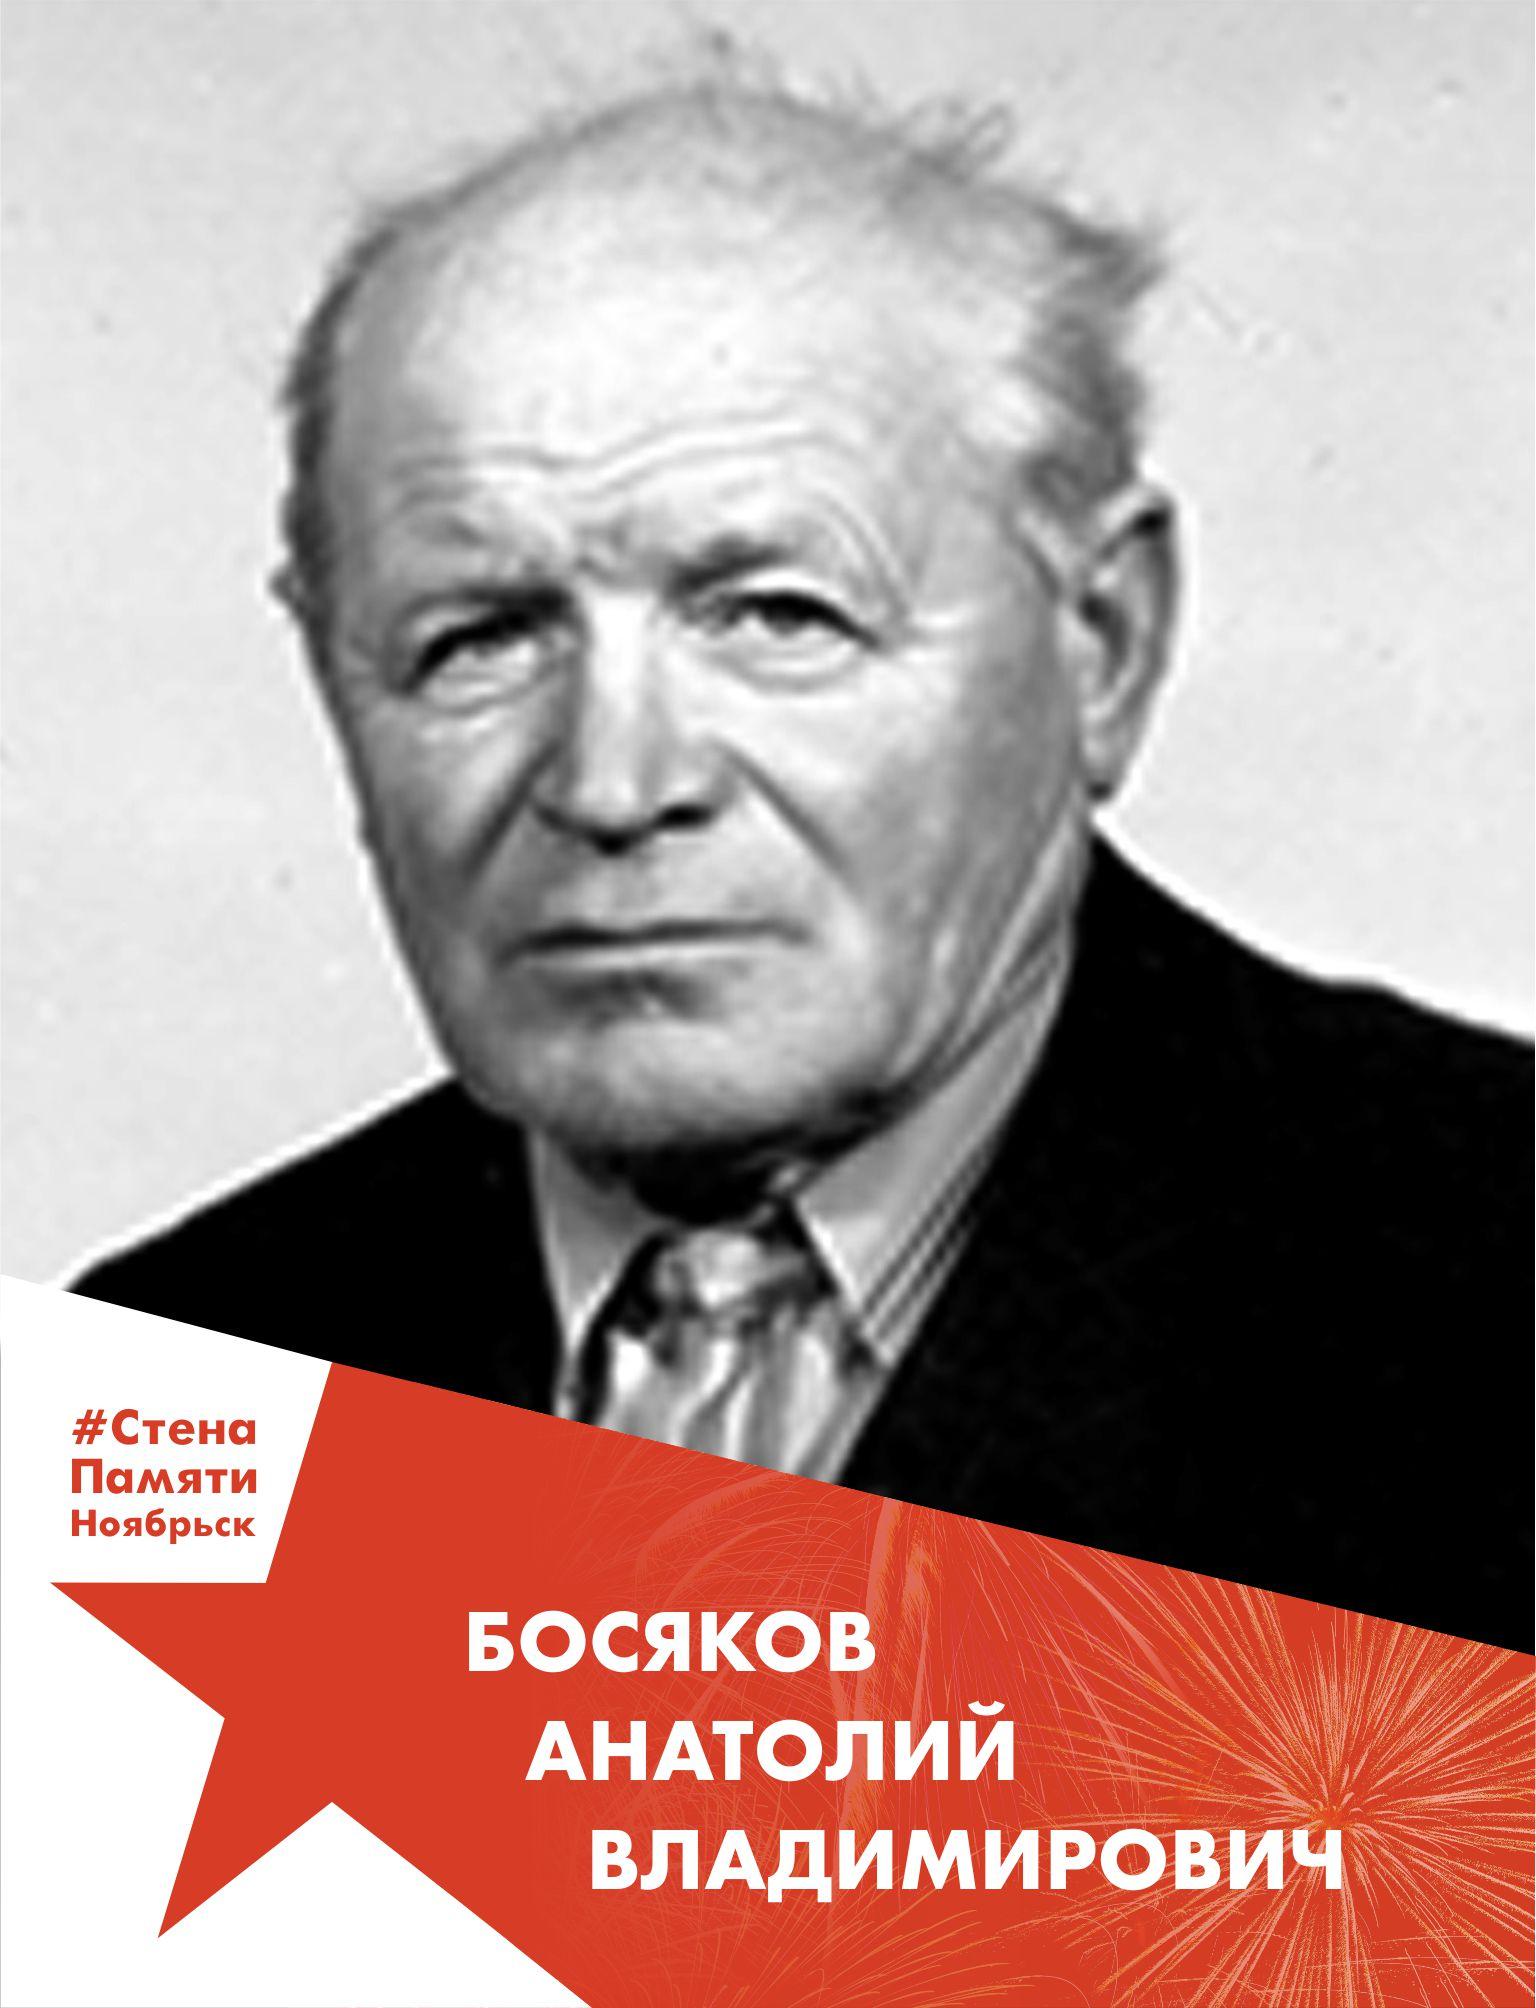 Босяков Анатолий Владимирович